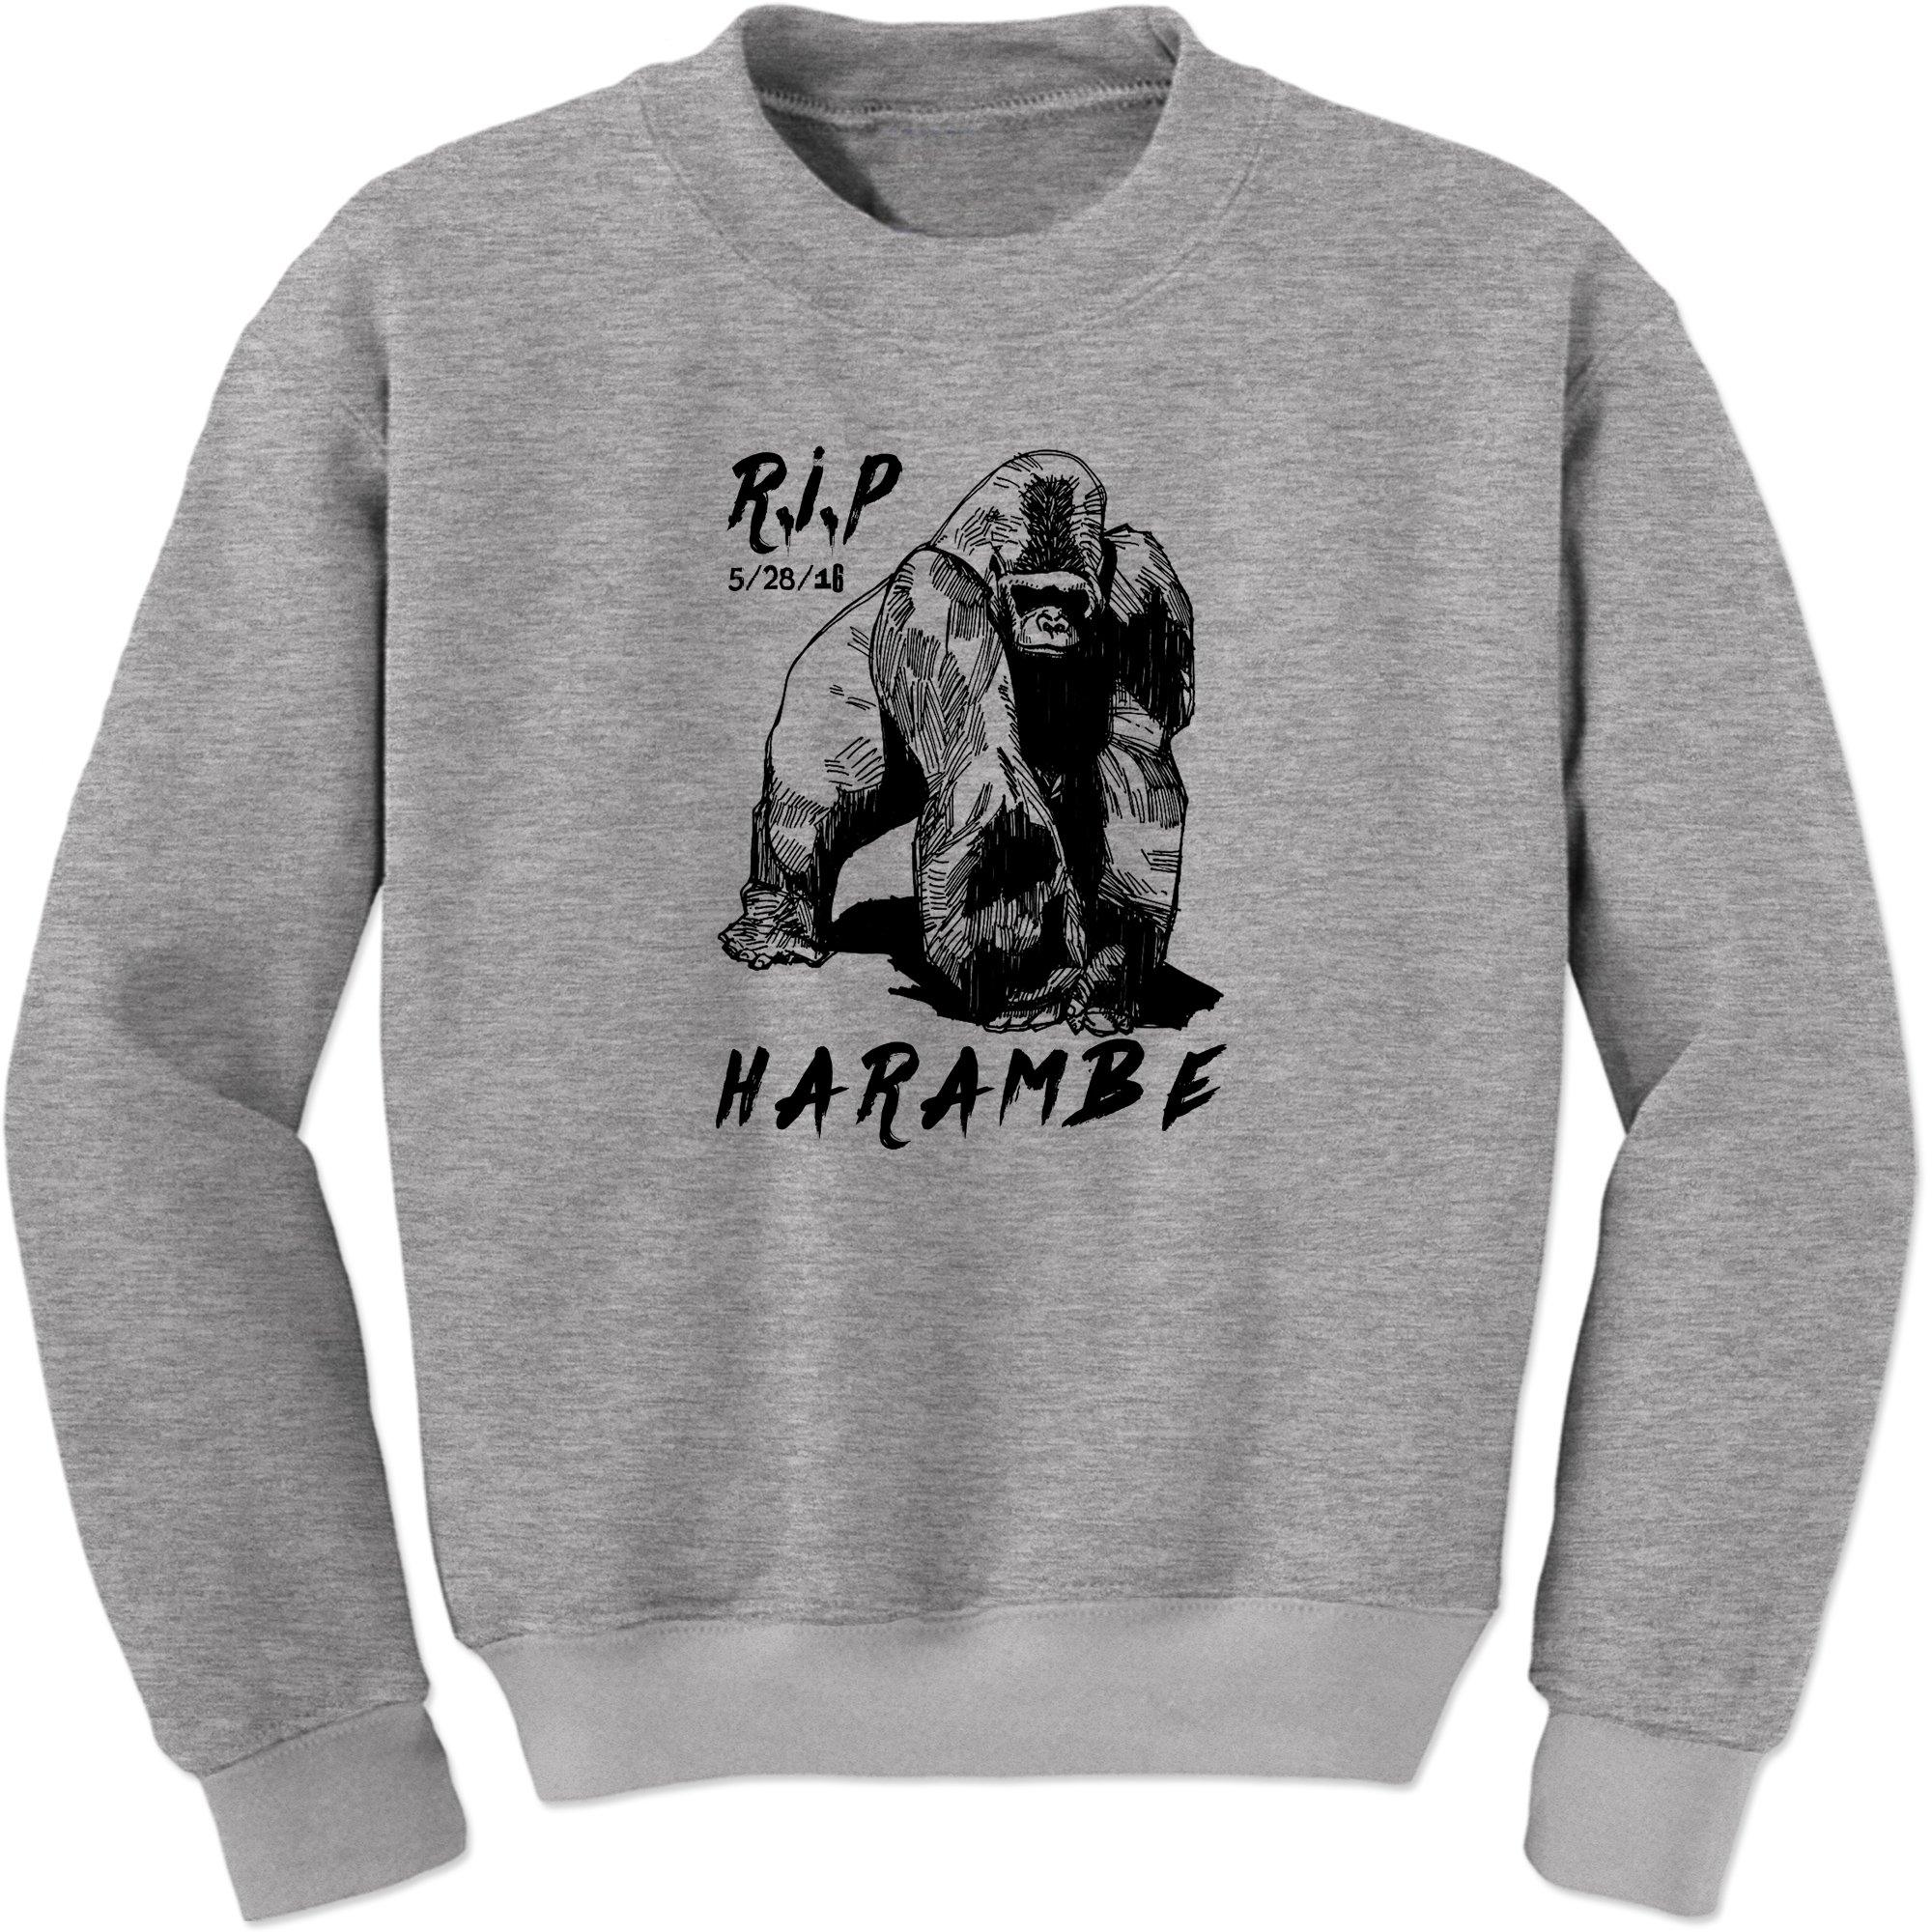 Rip Harambe Cincinnati Zoo Gorilla Crewneck 6620 Shirts